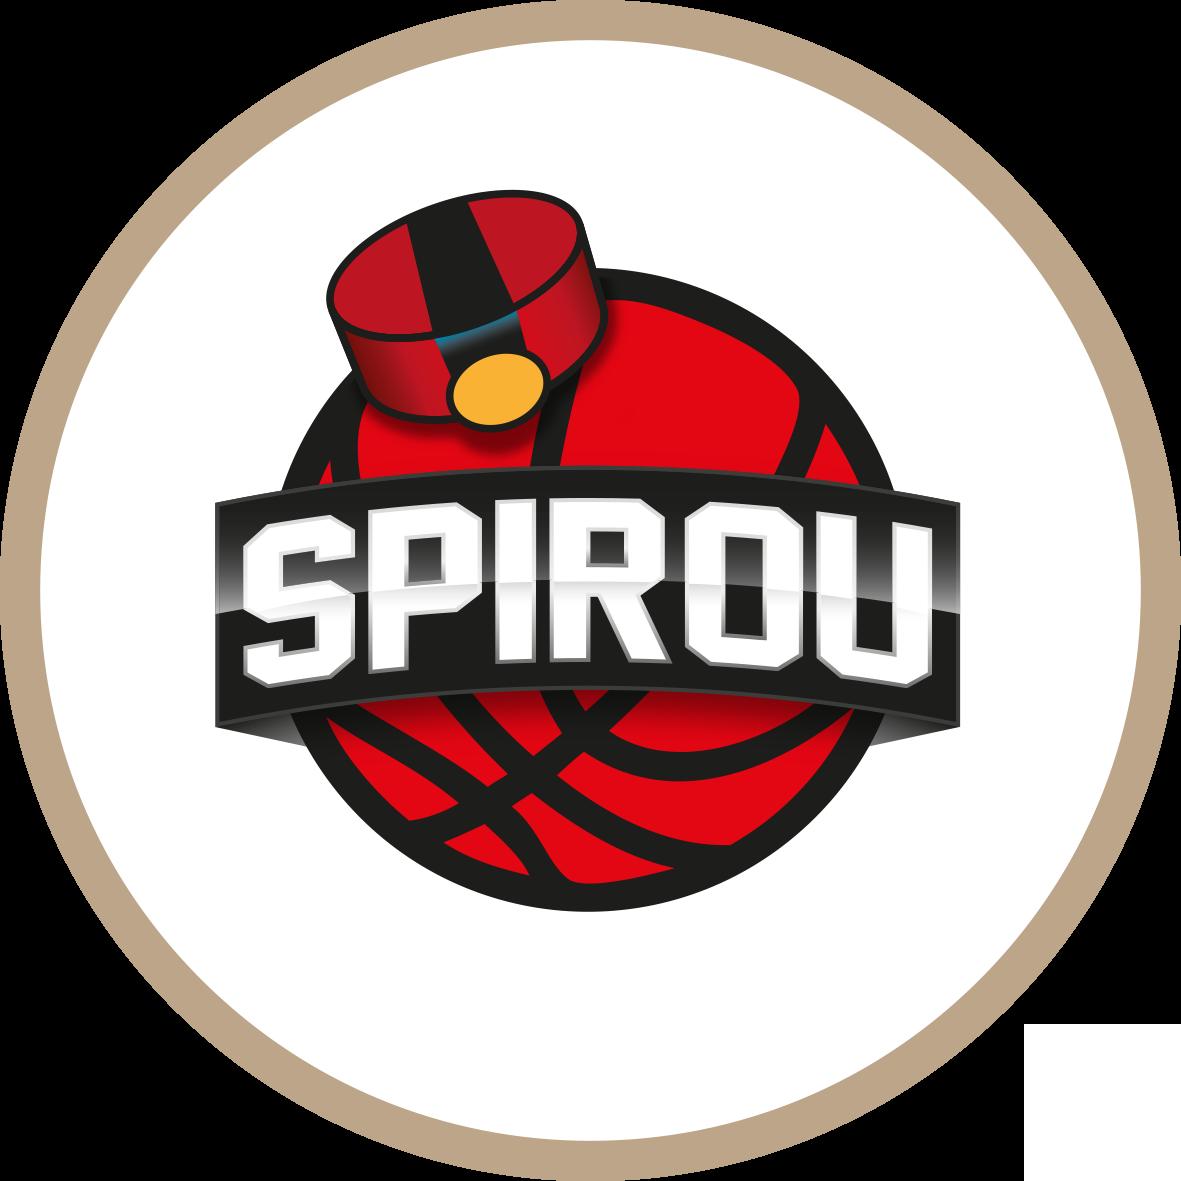 Spirou Basket Charleroi Charleroi